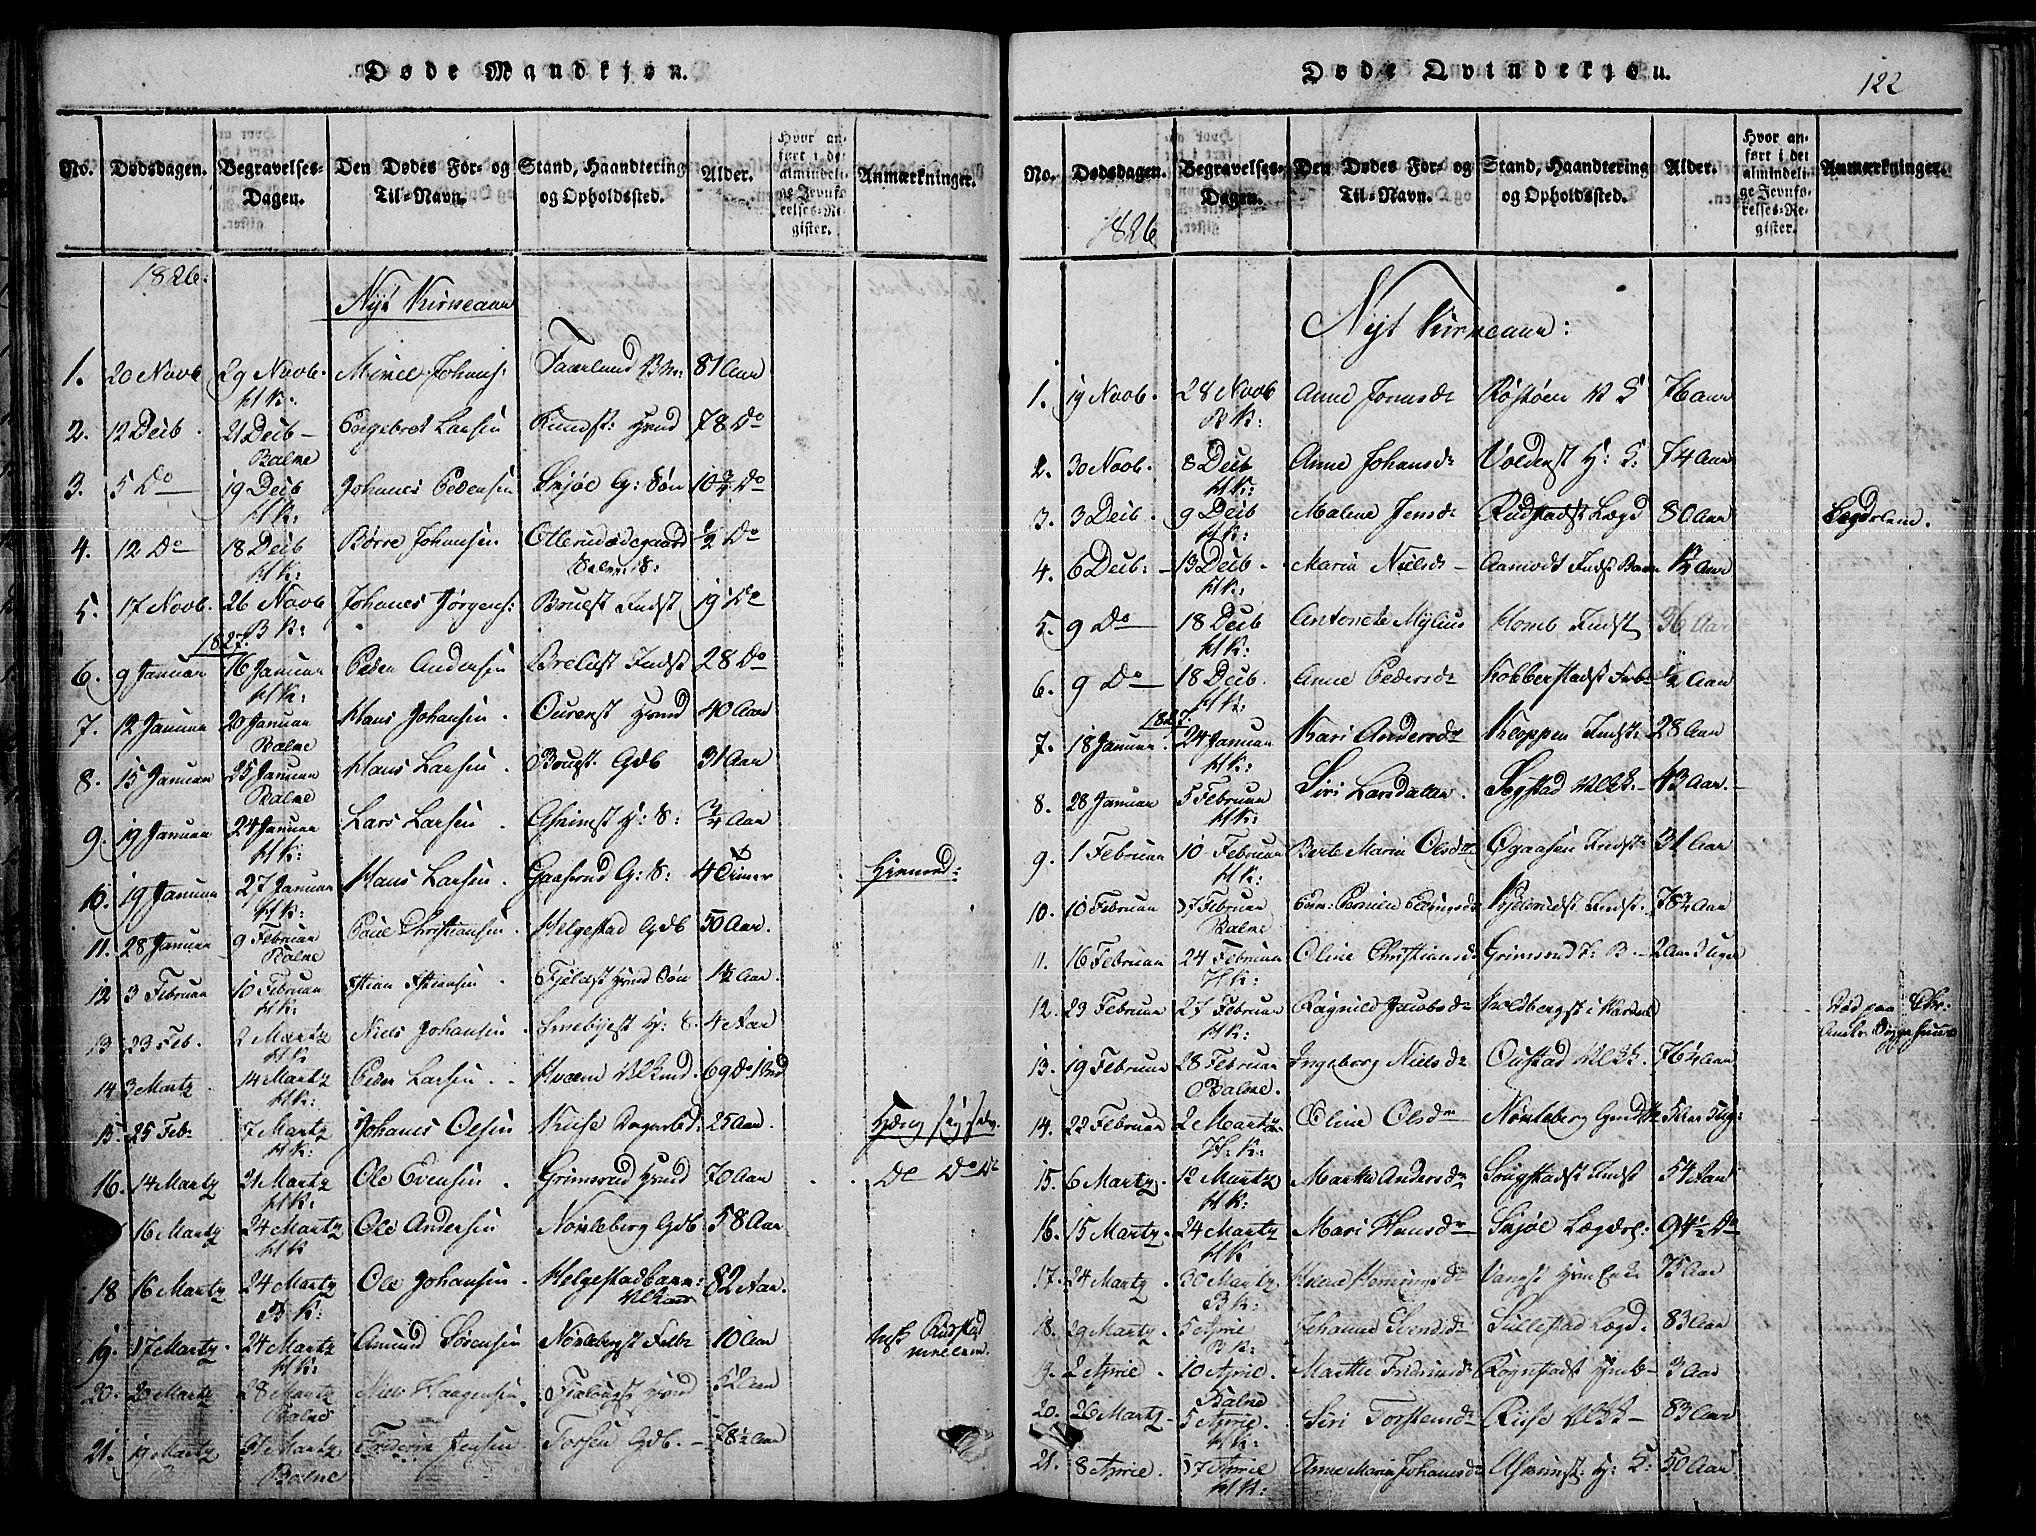 SAH, Toten prestekontor, Ministerialbok nr. 10, 1820-1828, s. 122